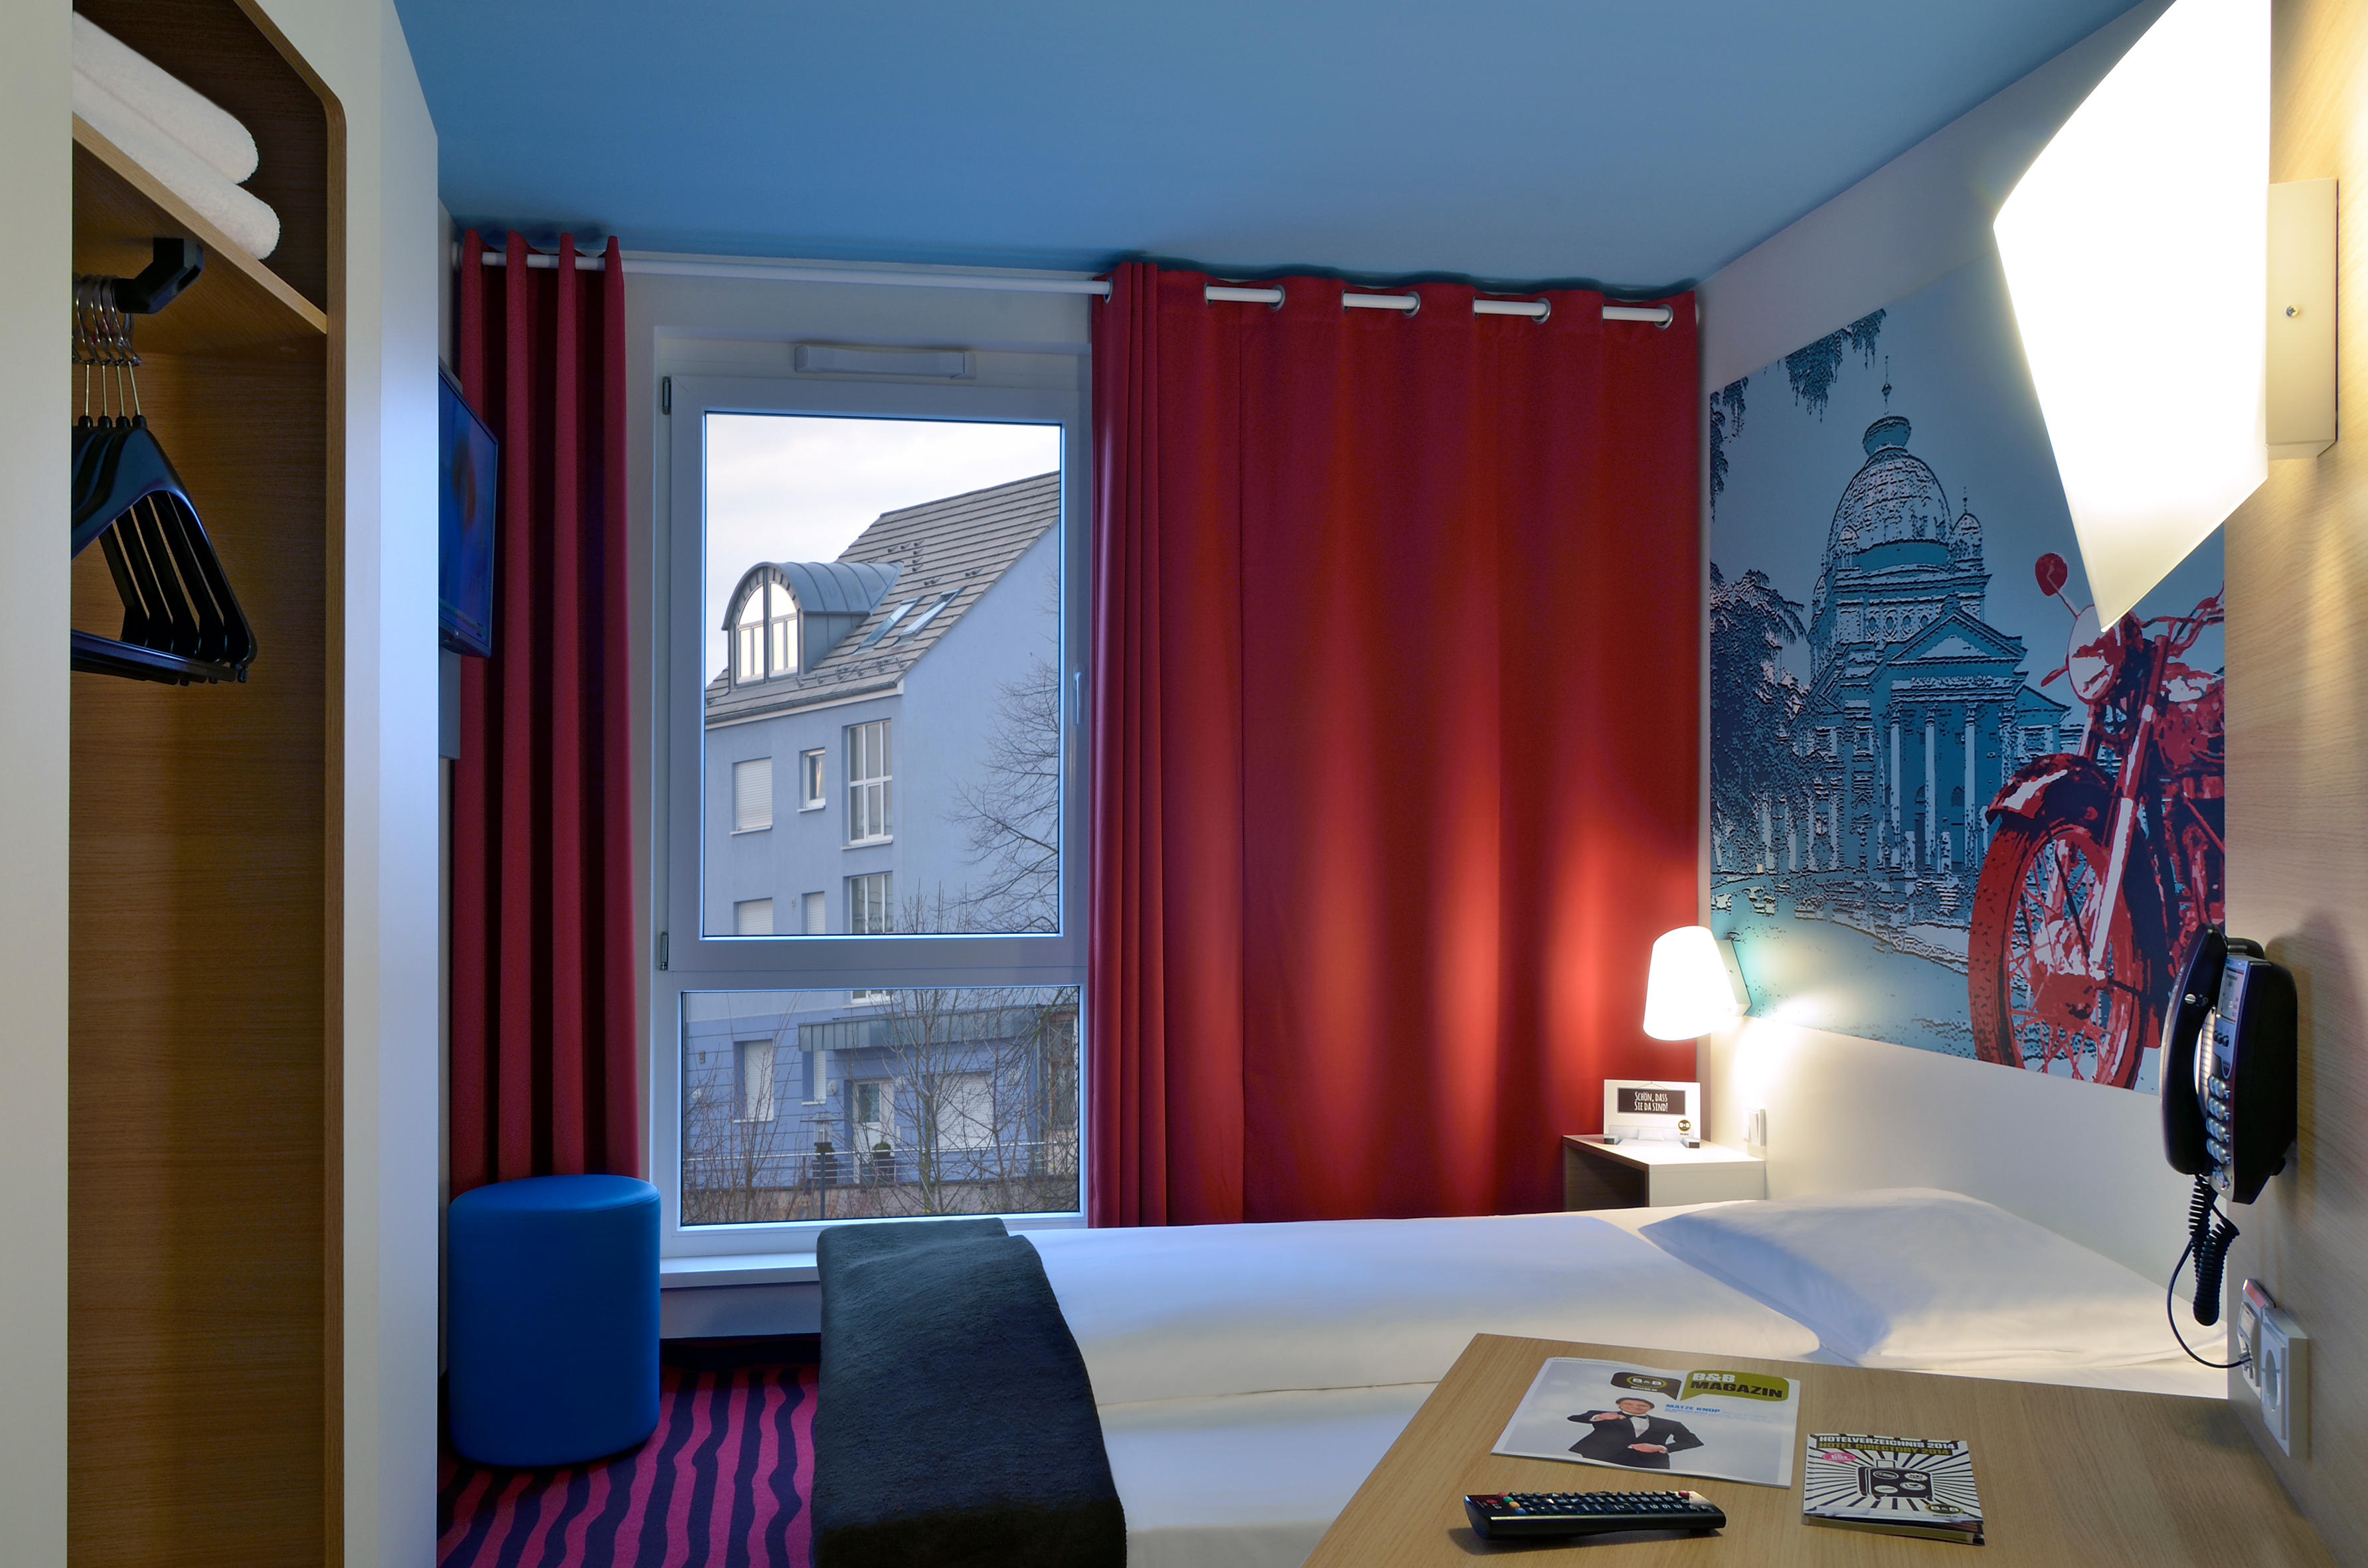 B&B Hotel Bad Homburg